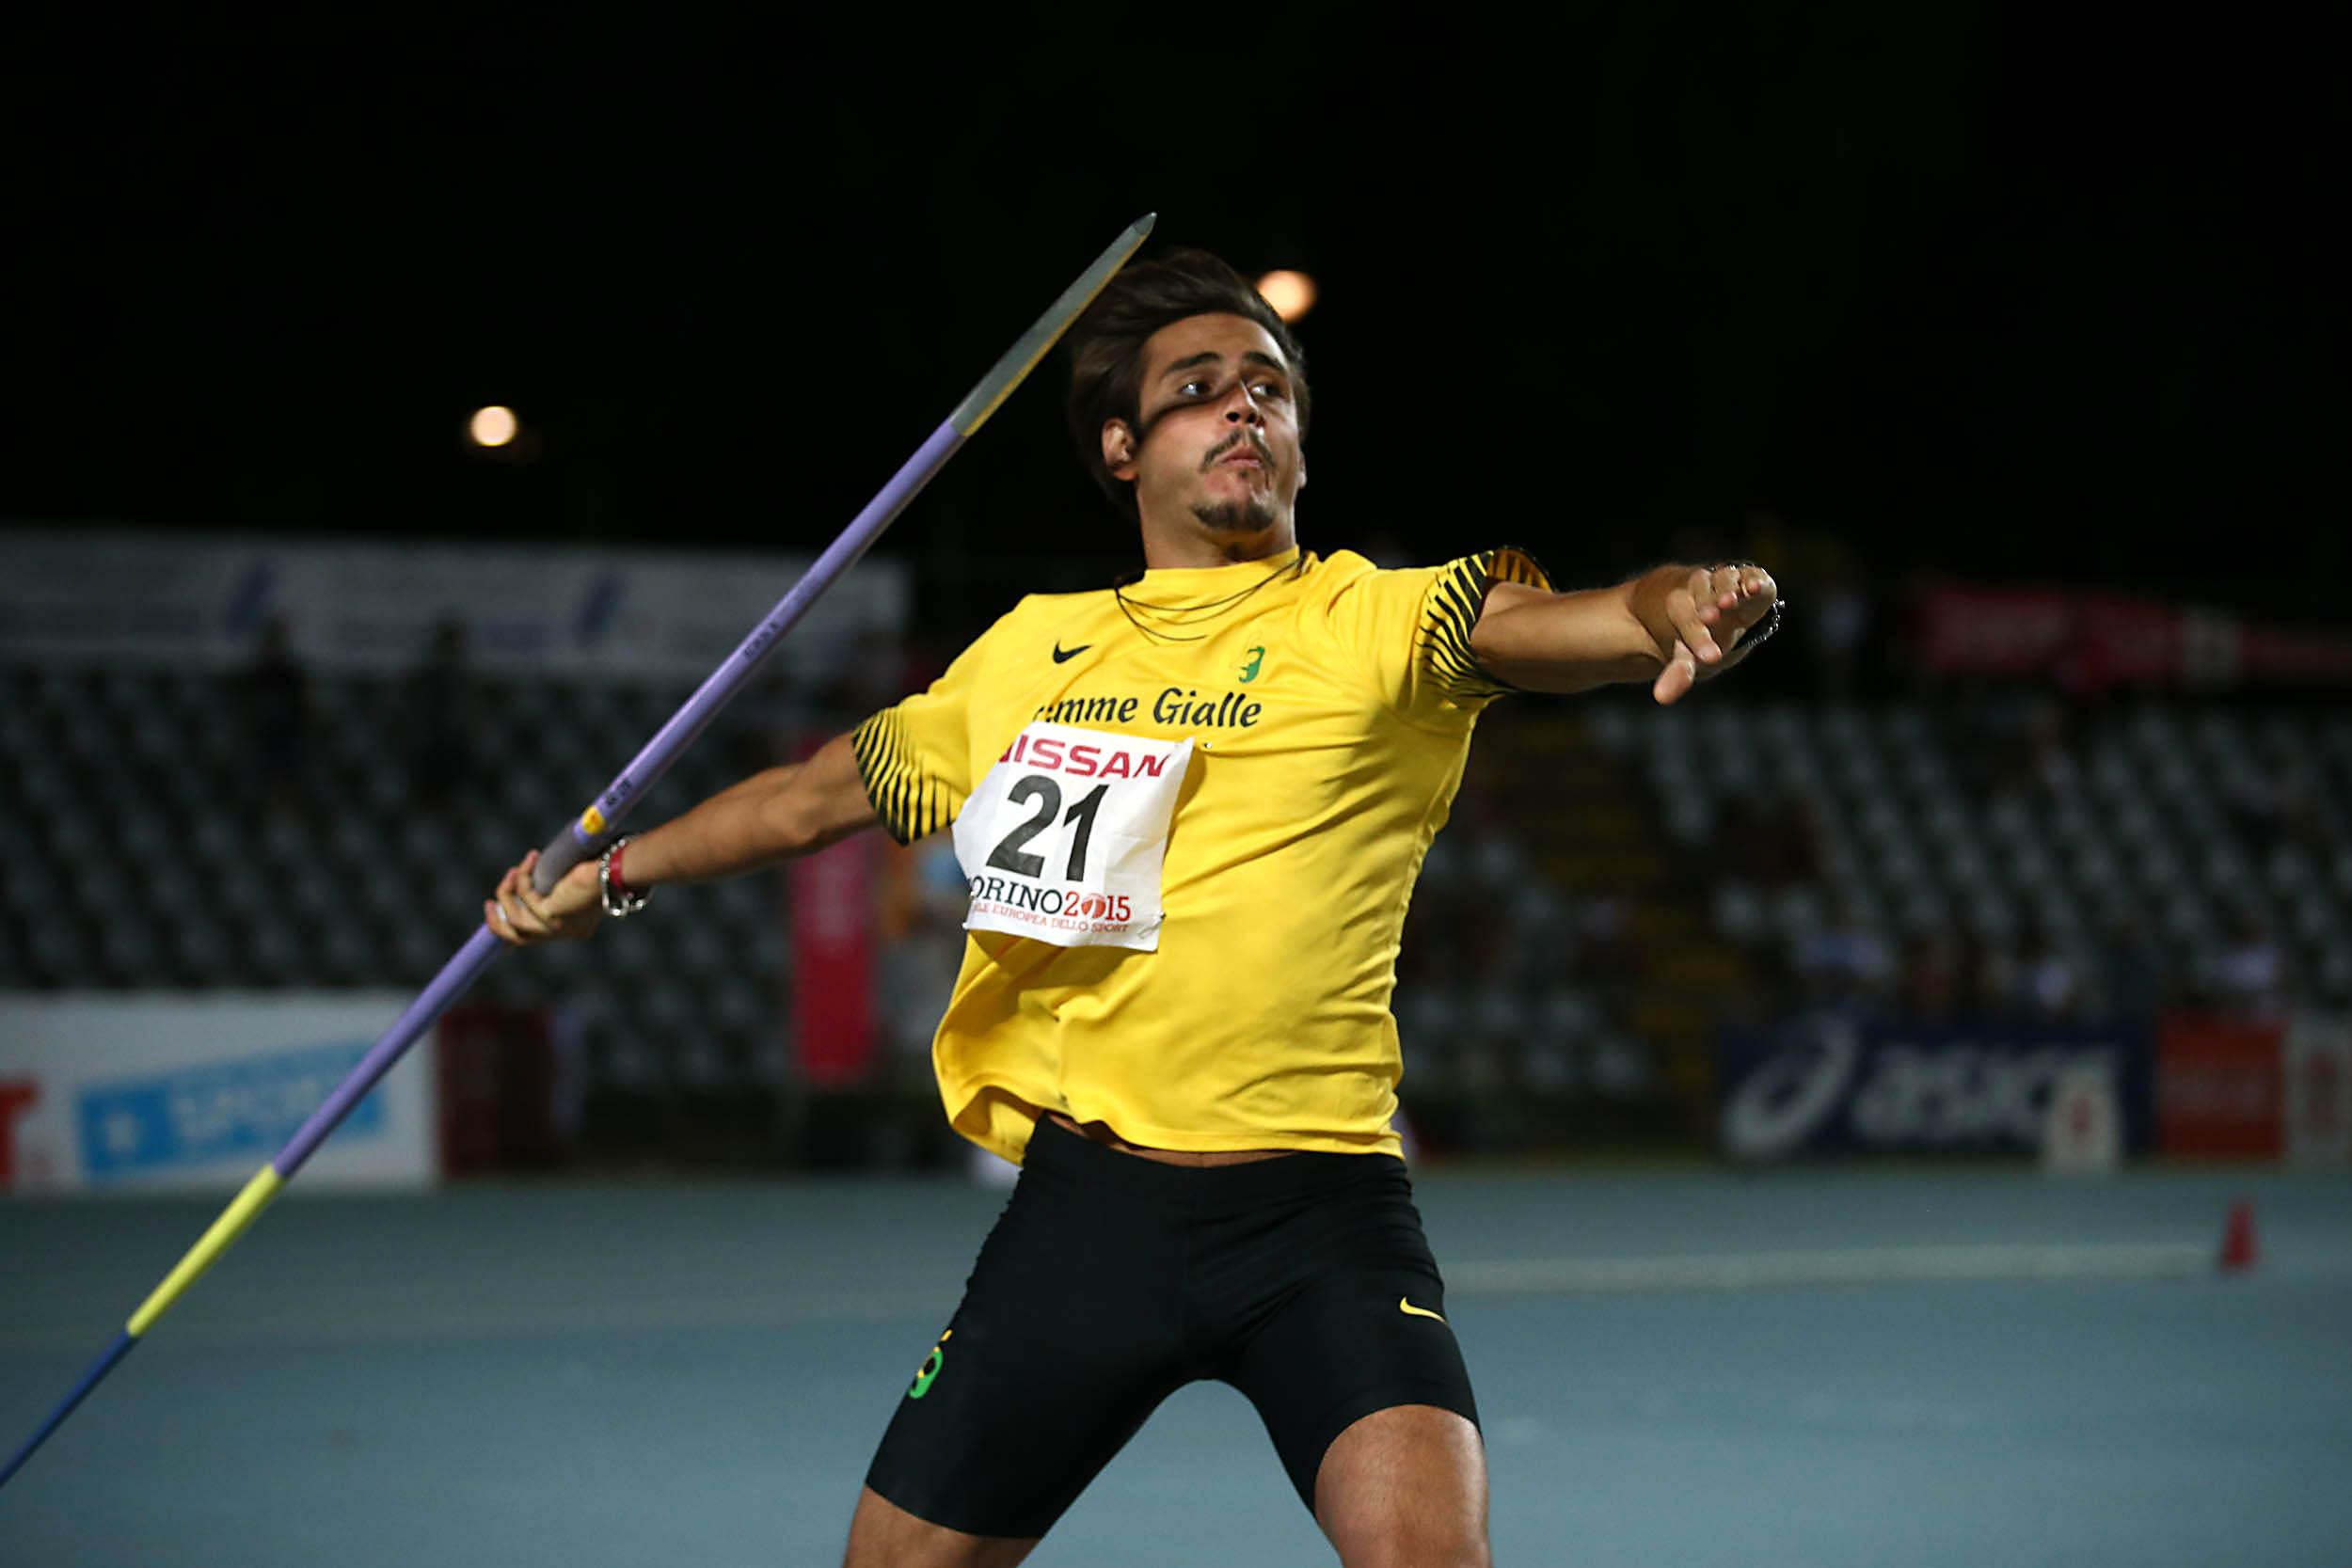 Assoluti: Tamberi di bronzo, Vandi record